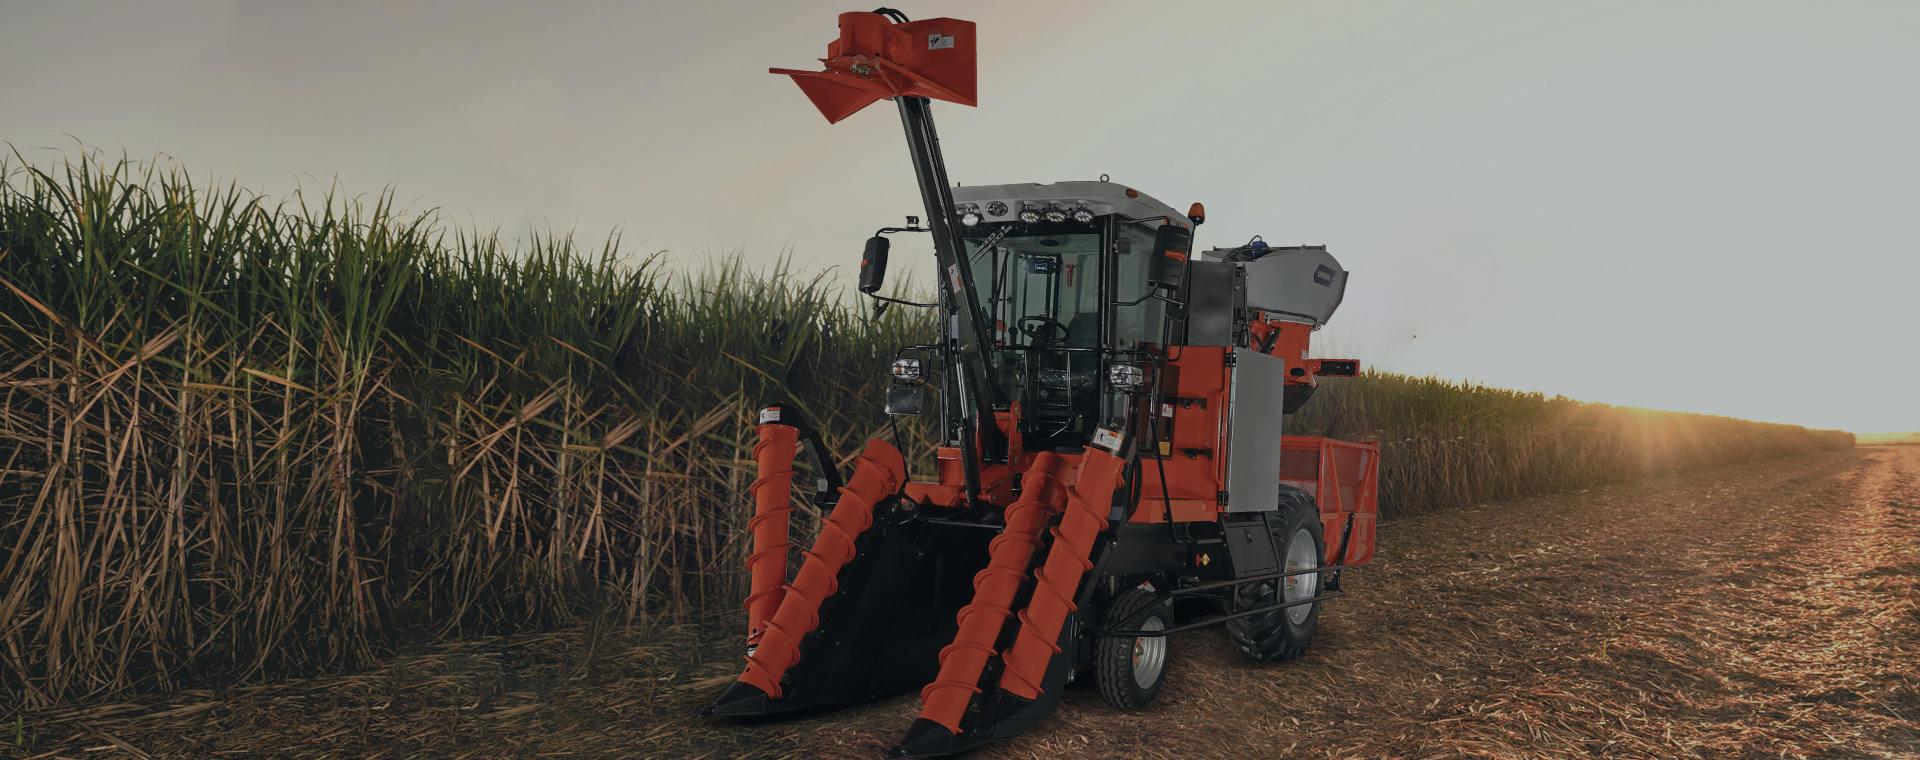 Chenhan Sugarcane Combine Harvester